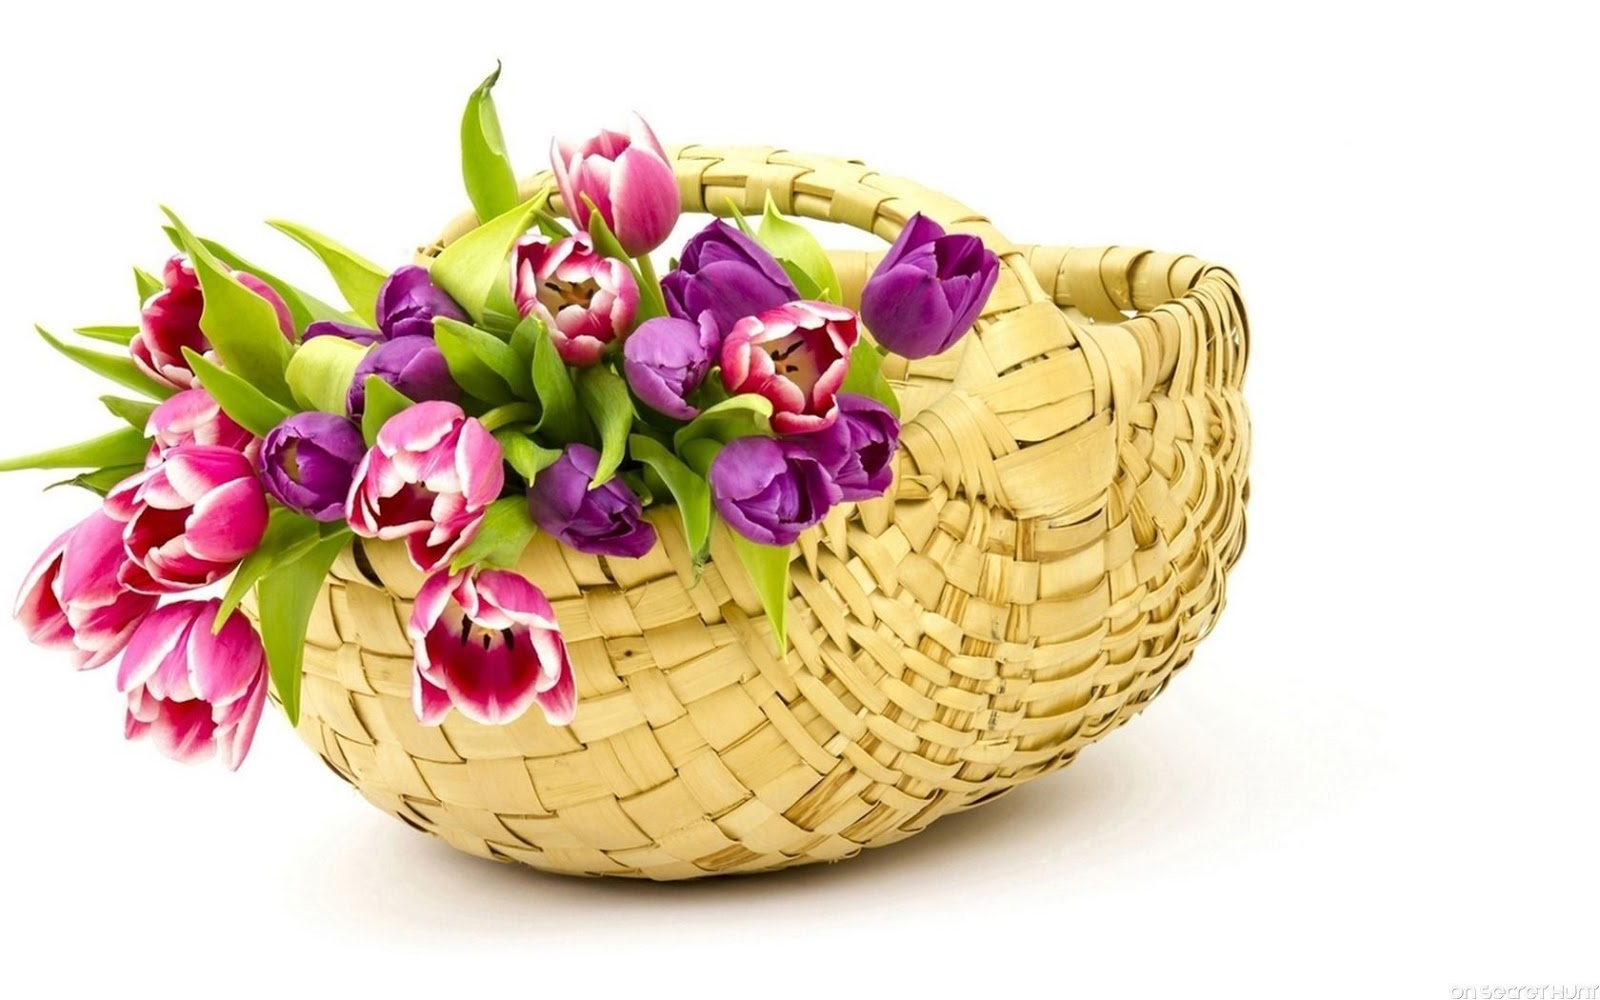 Beautiful flowers basket images flower wallpaper hd shayari urdu imagesurdu shayari with pictureurdu shayari wallpaper beautiful flowers basket hd image 2016beautiful flowers basket izmirmasajfo